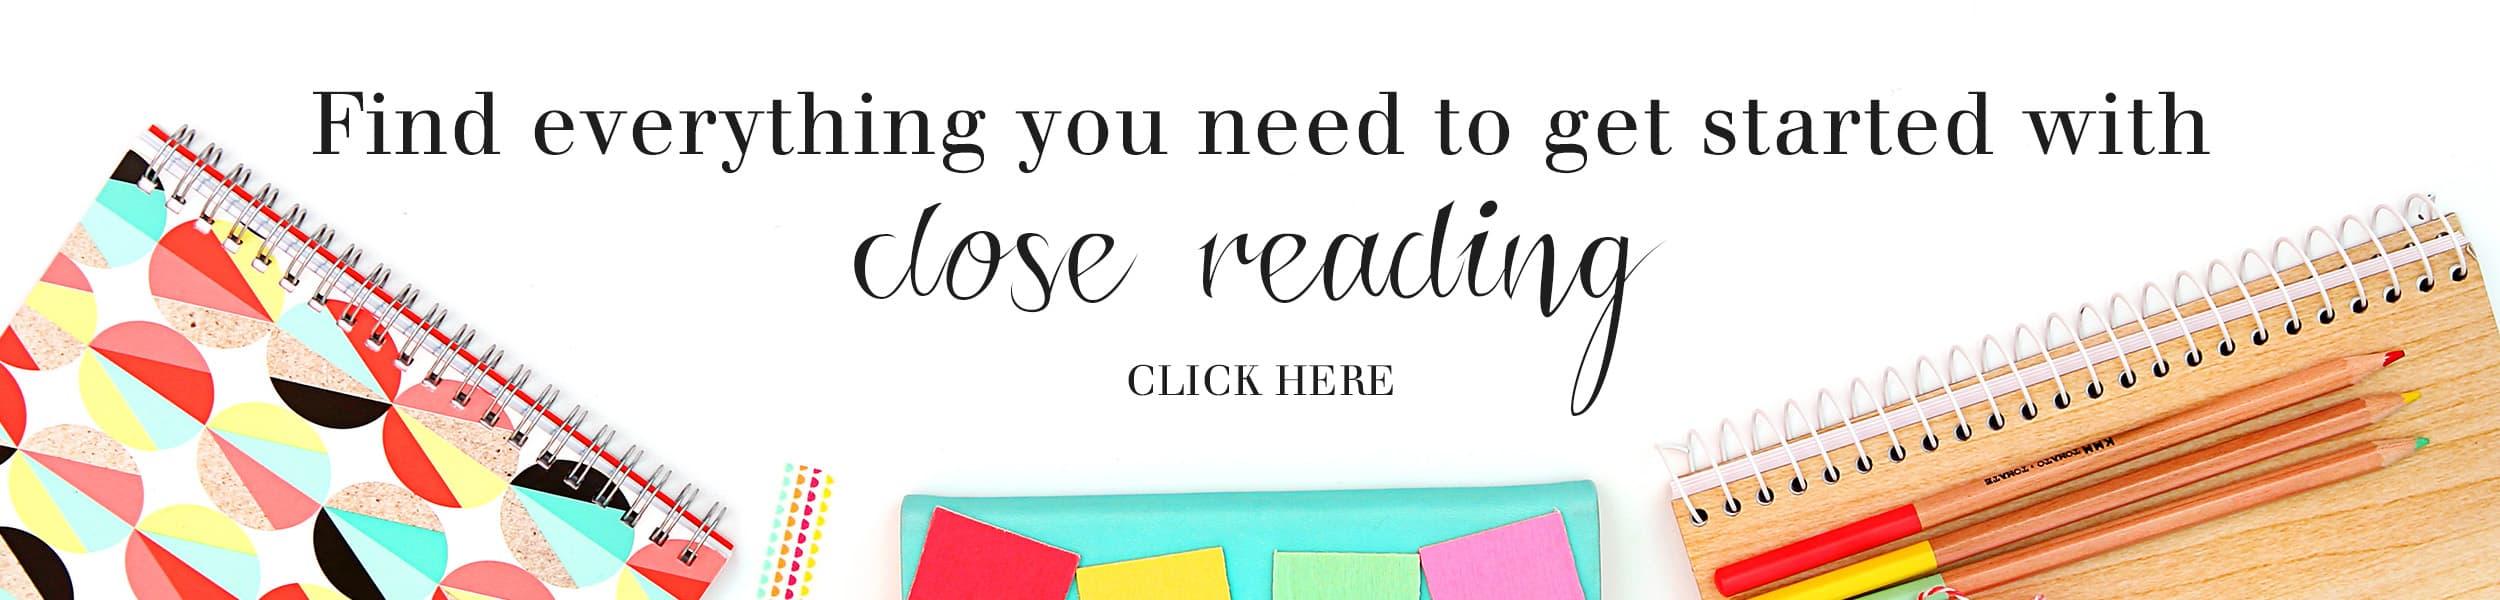 slider_close reading